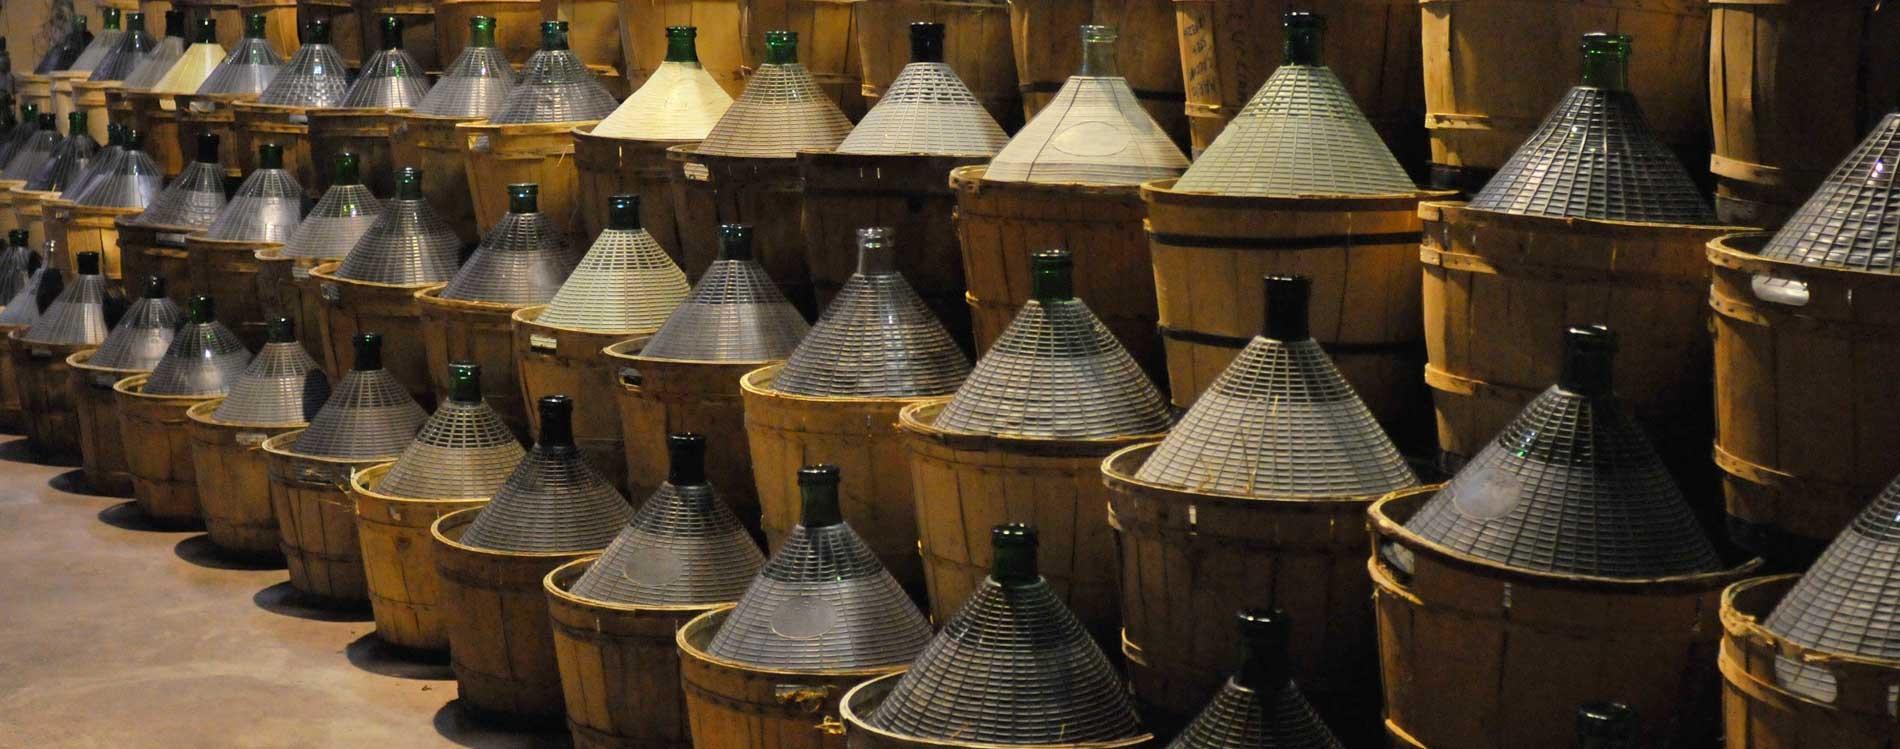 VINI VENETI - VENDITA VINO SFUSO TREVISO La cantina fratelli Zaghis produce e vende vini bianchi e vini rossi a Treviso. La nostra cantina è a Gorgo al Monticano